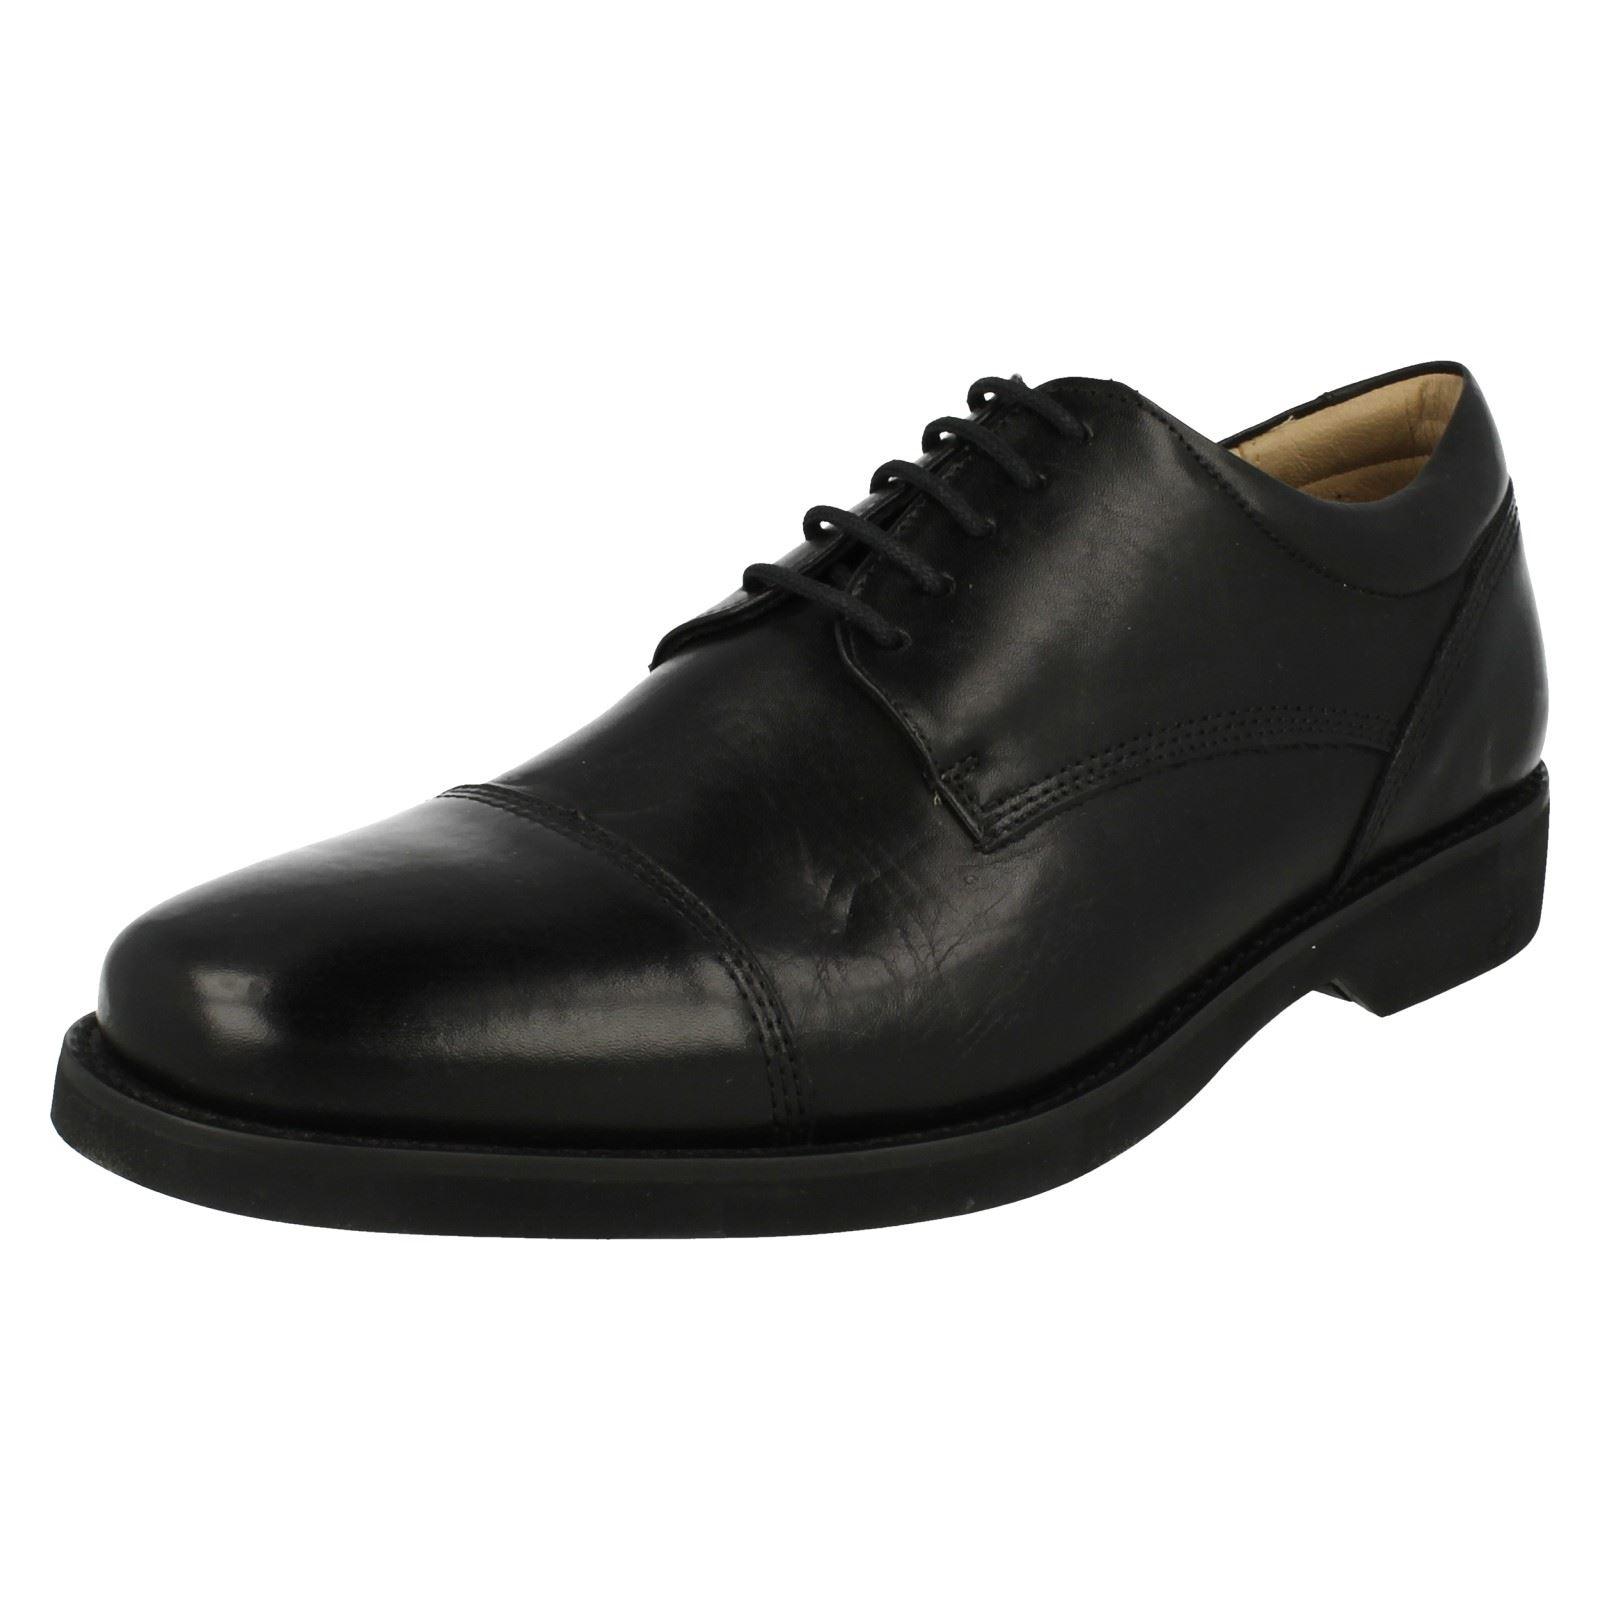 Anatomic&Co - Zapatos de cordones de Piel para hombre Negro negro 45 68o8AmWaQq